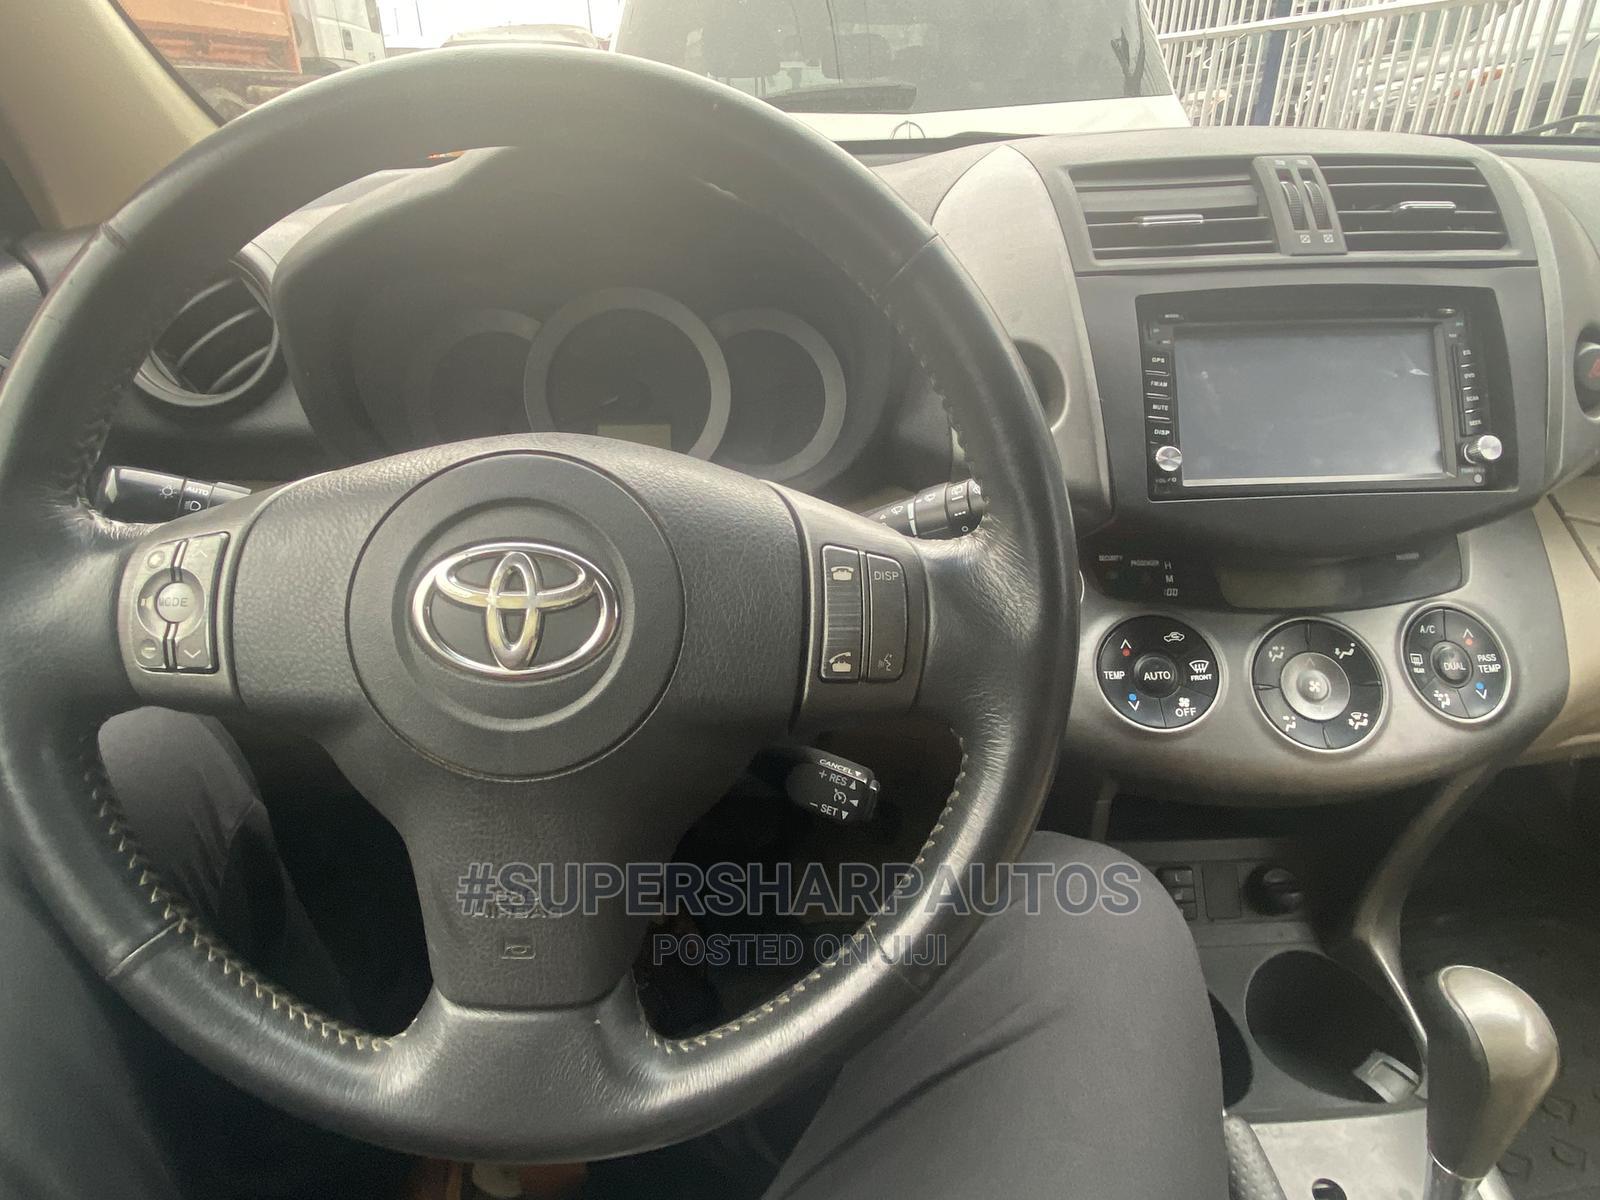 Toyota RAV4 2010 3.5 Limited 4x4 Gray | Cars for sale in Amuwo-Odofin, Lagos State, Nigeria